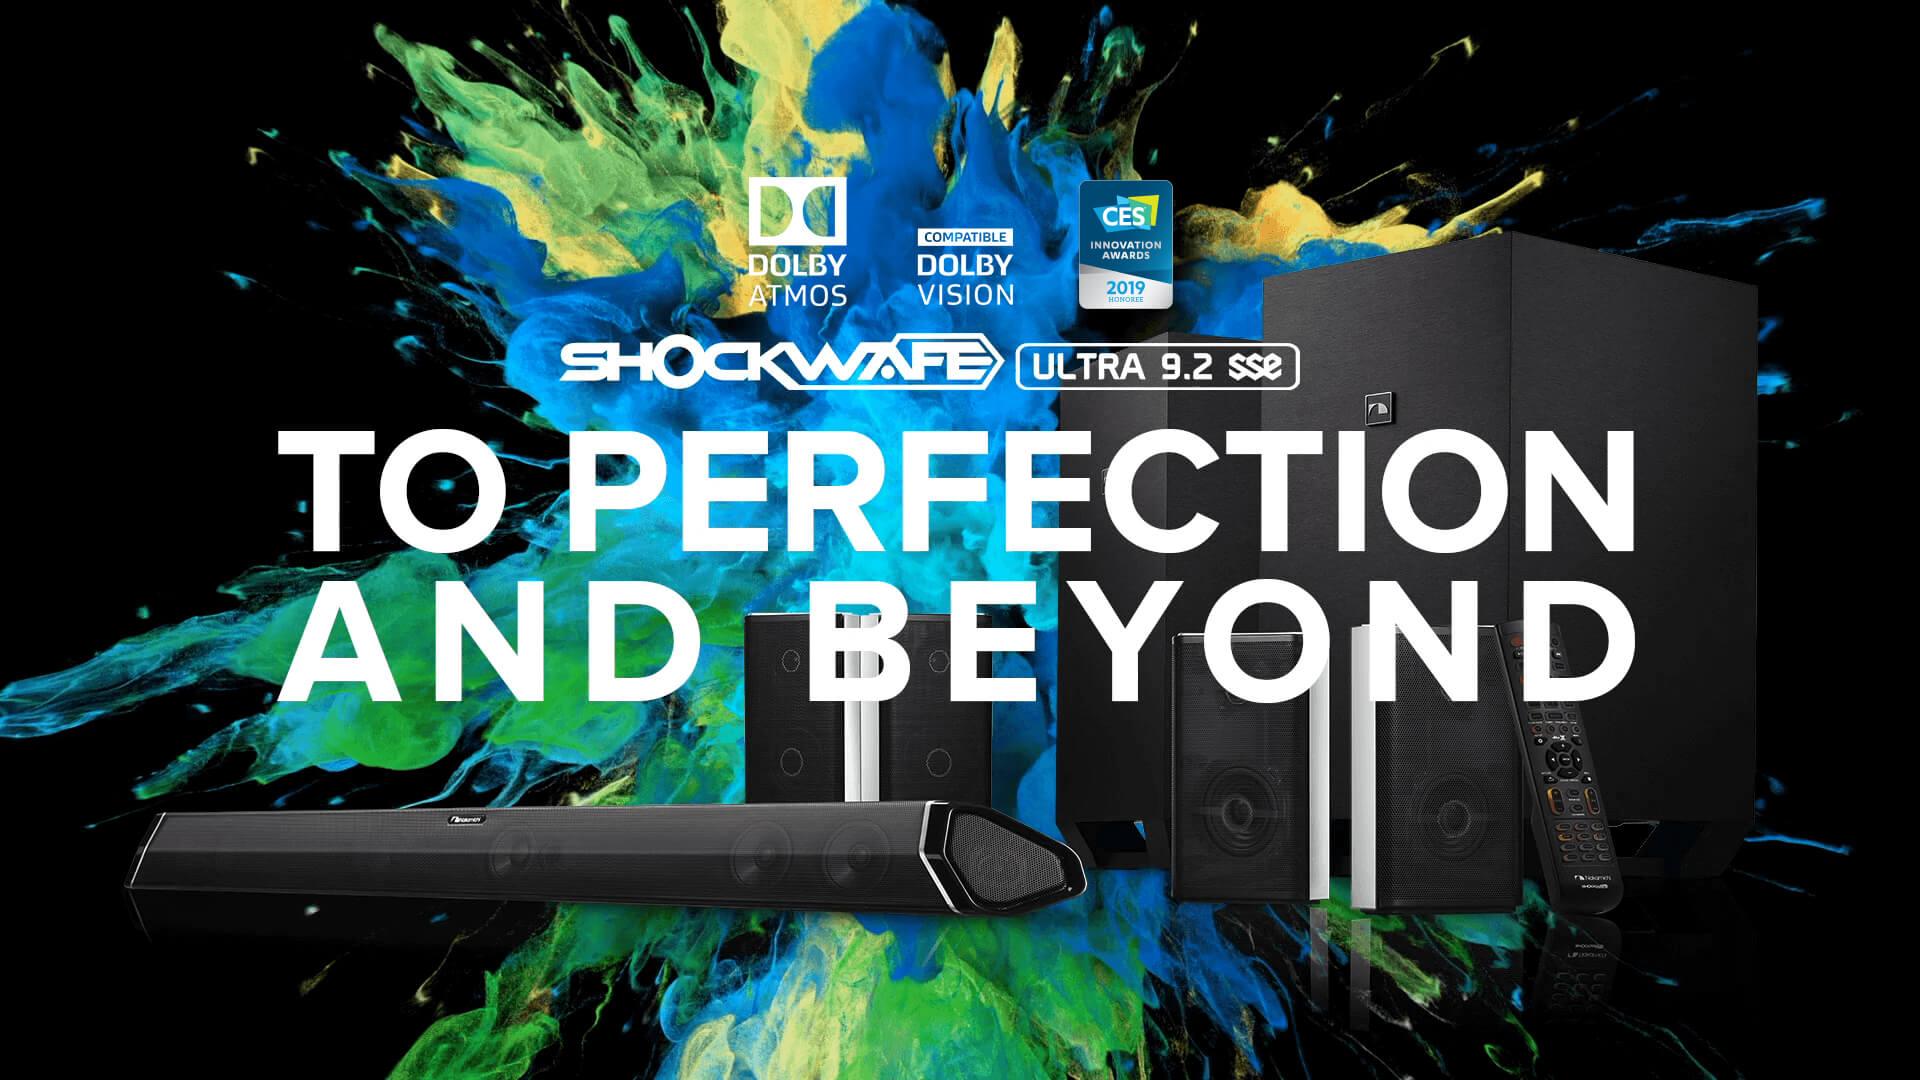 Nakamichi Usa True Surround Soundbar With Dolby Atmos Dts X